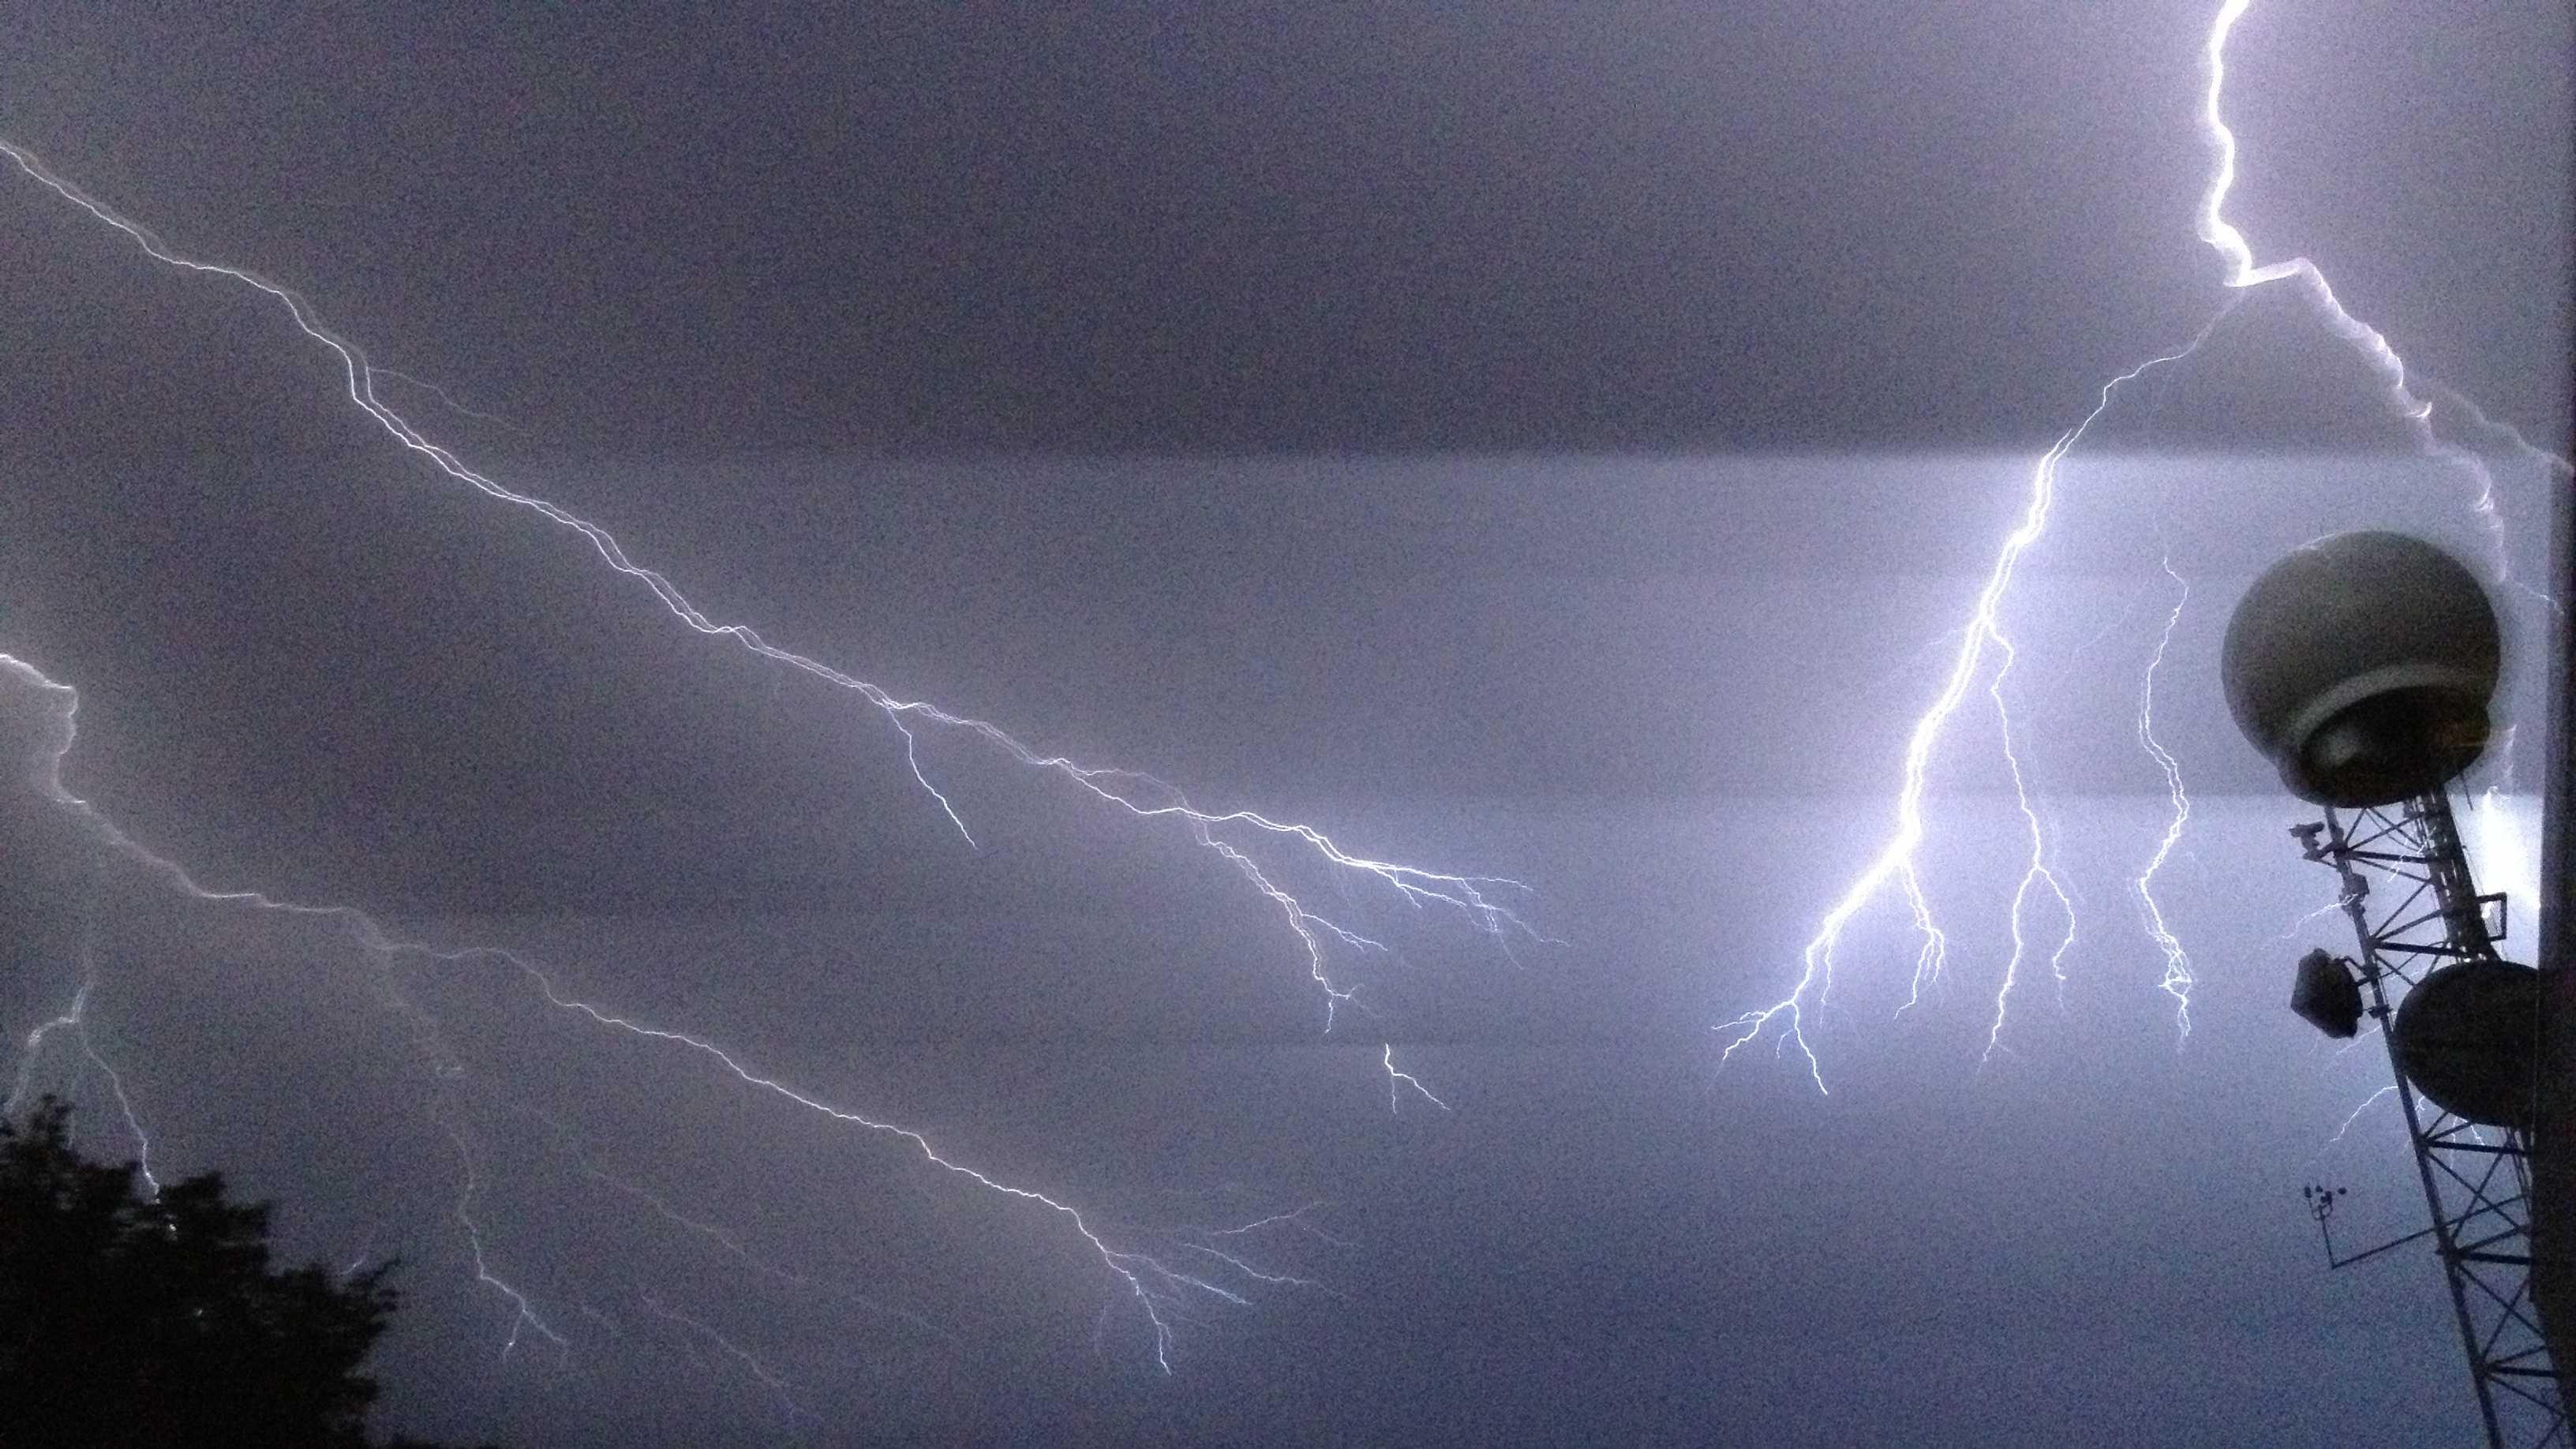 storm june 26 (4).JPG